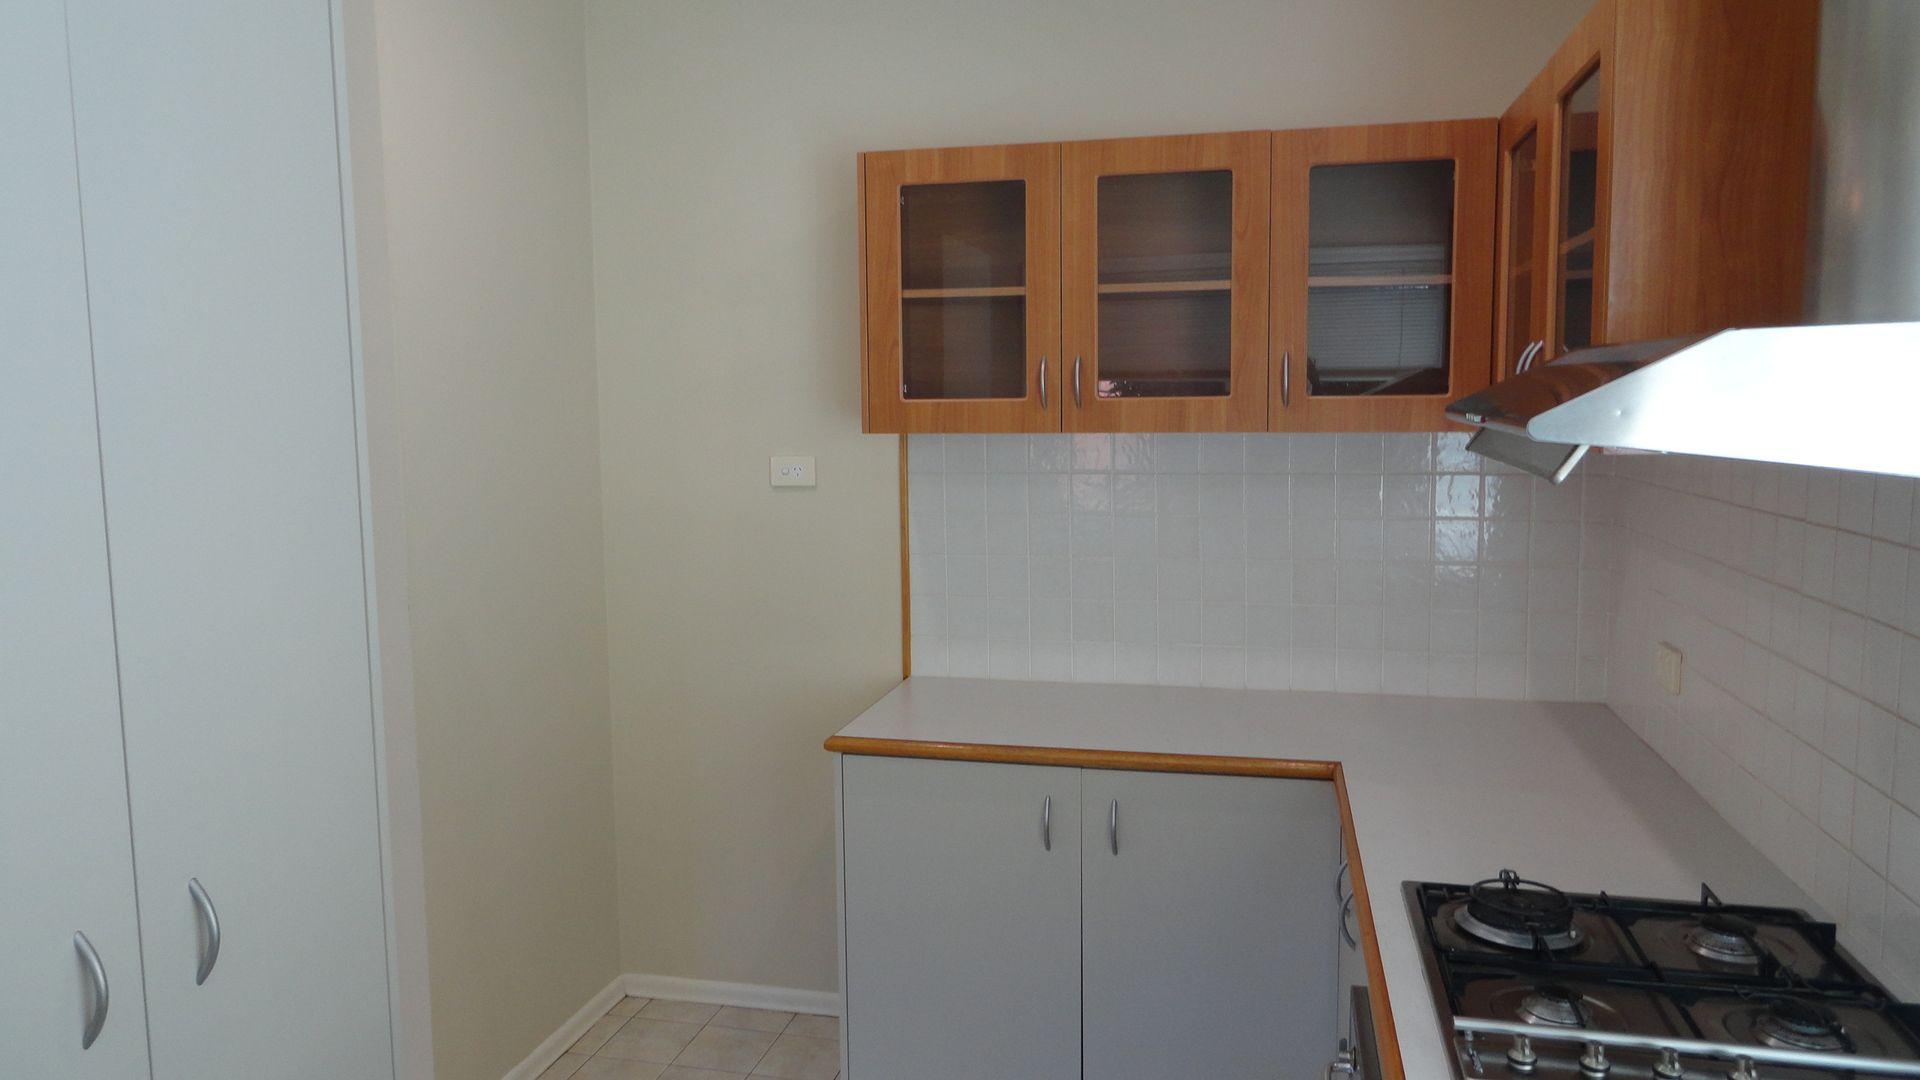 5/310-314 Mackenzie Street, Rangeville QLD 4350, Image 2